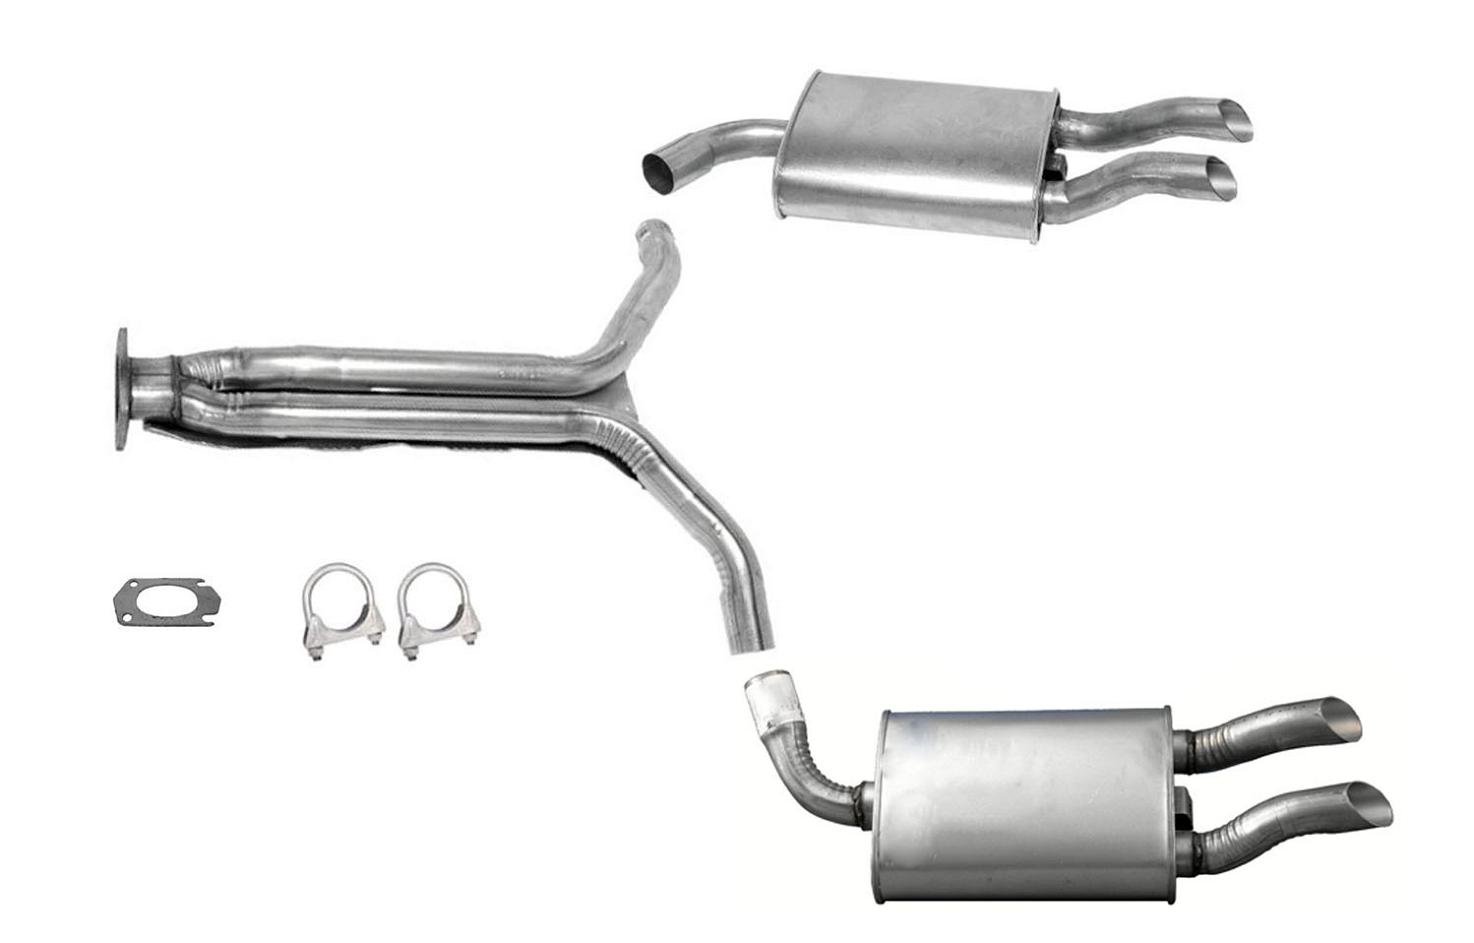 1985 Corvette Muffler Exhaust System New 4b1243 18418